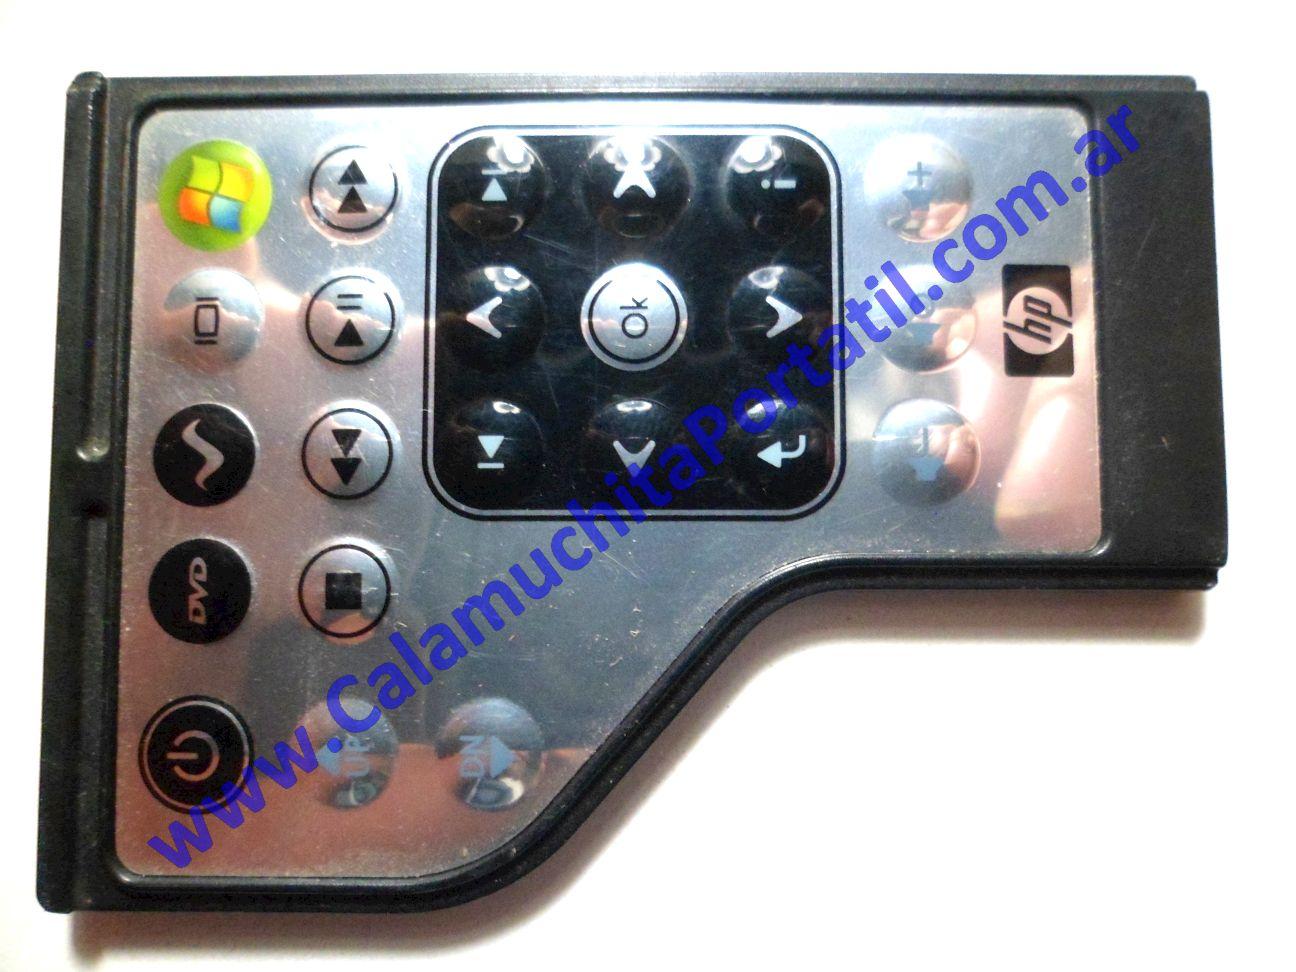 0224ACR Control Remoto Hewlett Packard Pavilion dv4-1212la / NL276LA#AC8